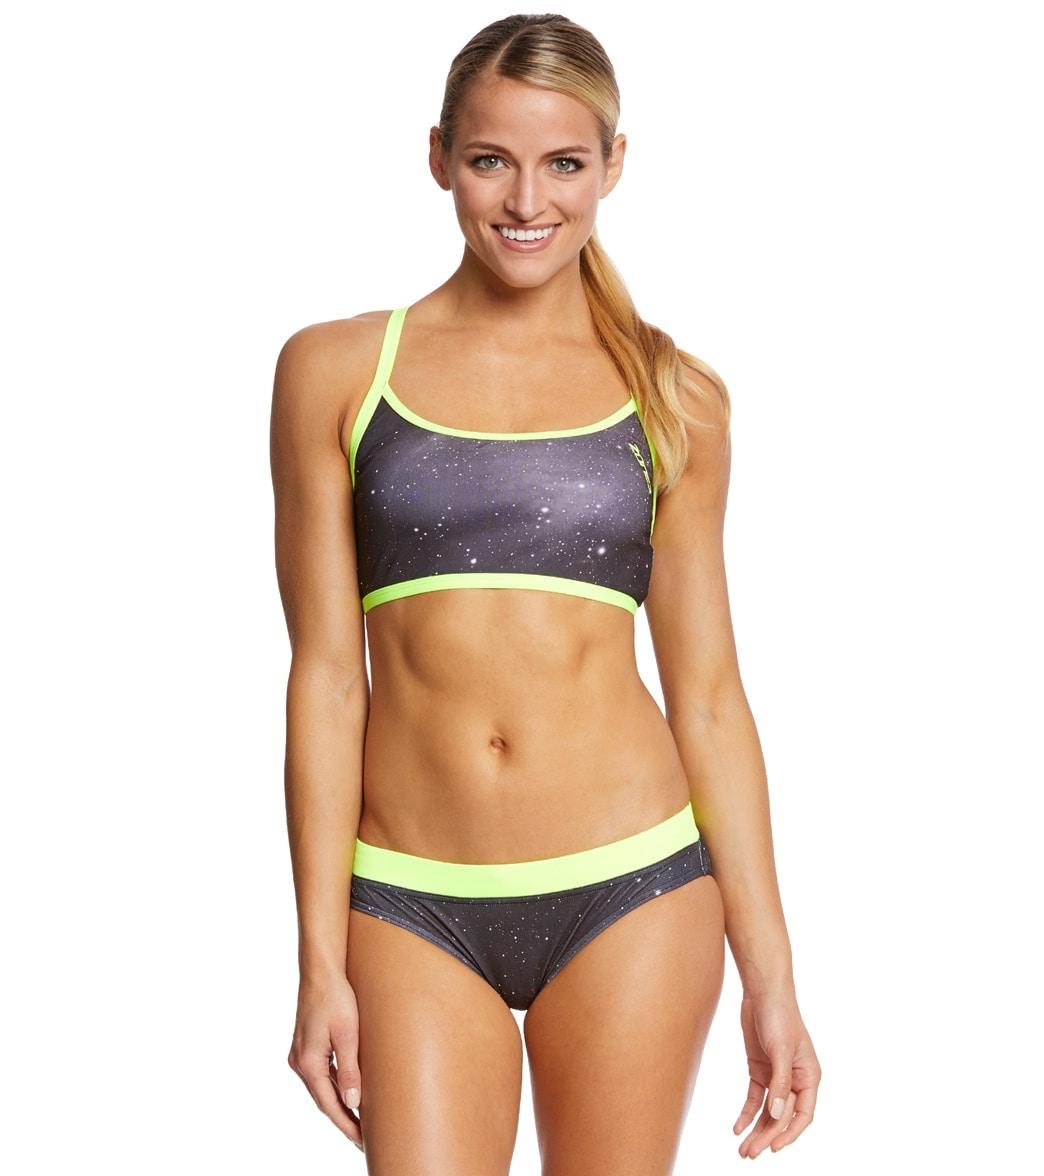 ce5551a333e85 Zone 3 Women s Cosmic Two Piece Bikini at SwimOutlet.com - Free Shipping